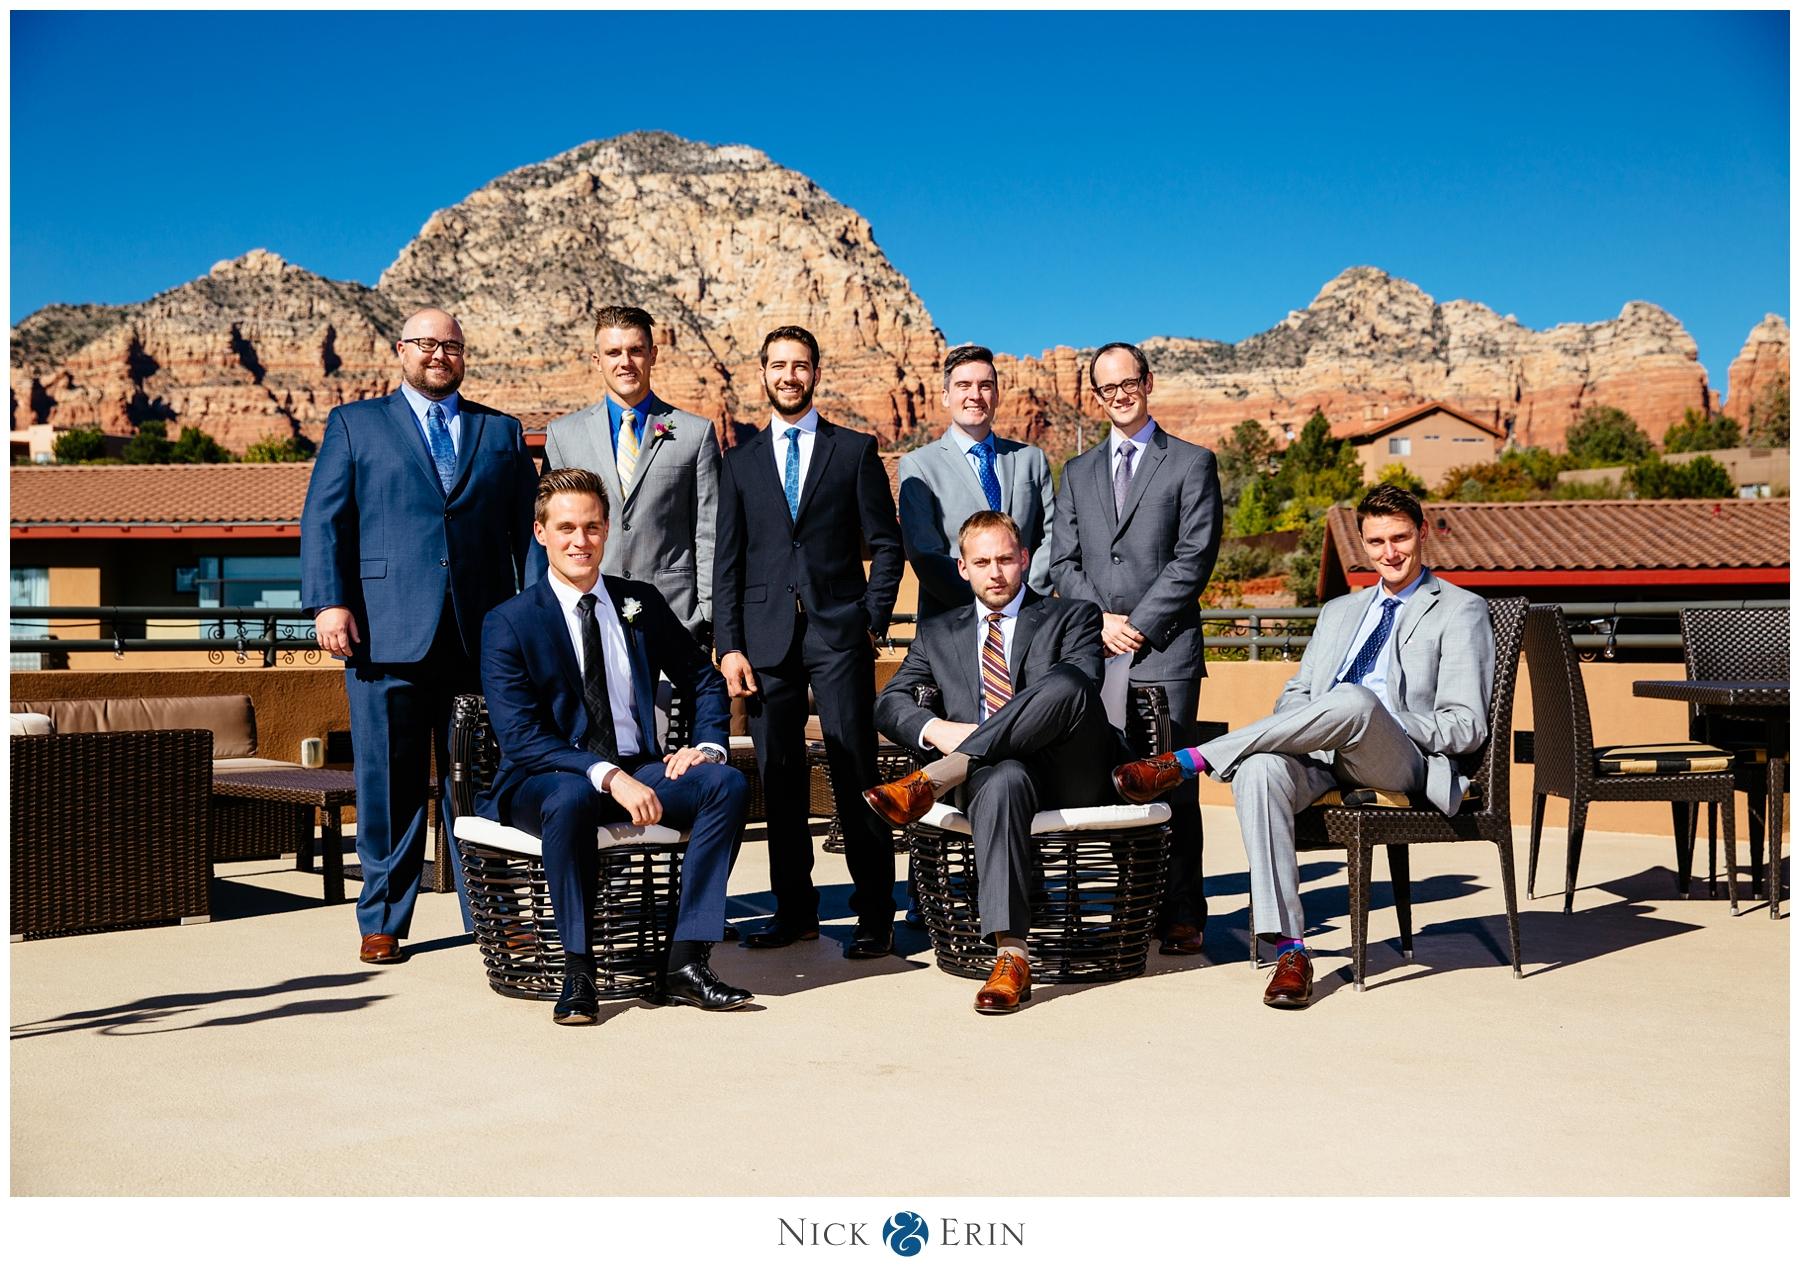 Donner_Photography_Sedona Arizona Wedding_Alissa and Tom_0030